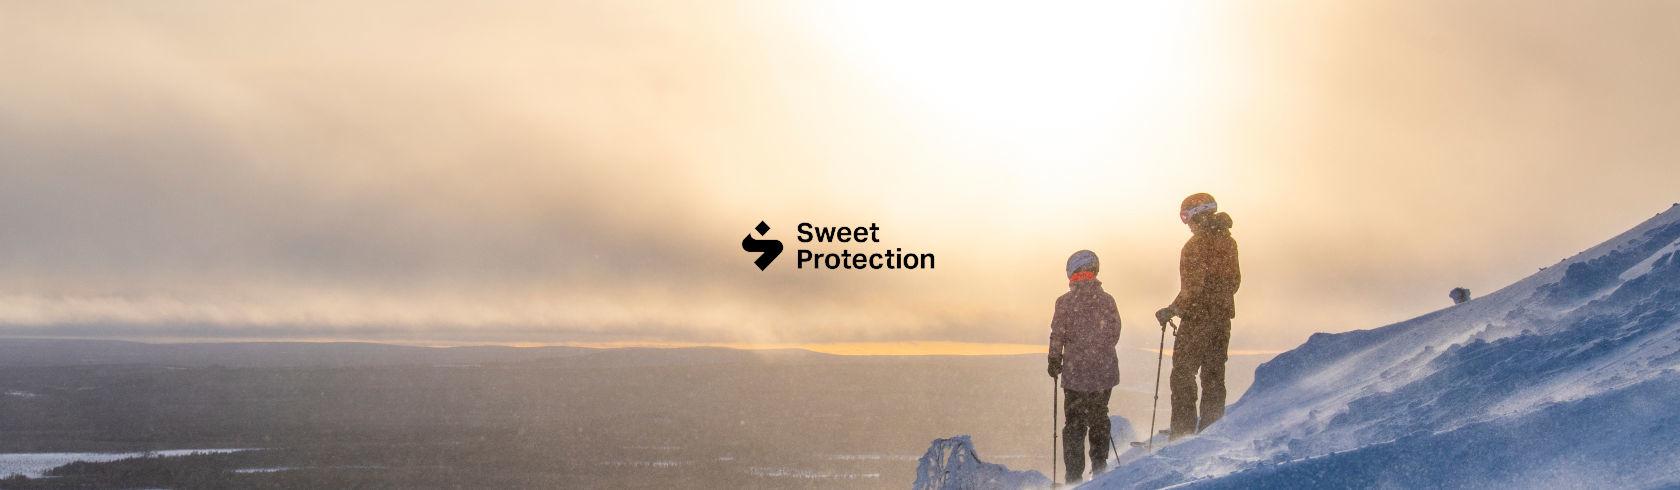 Sweet Protection brand logo